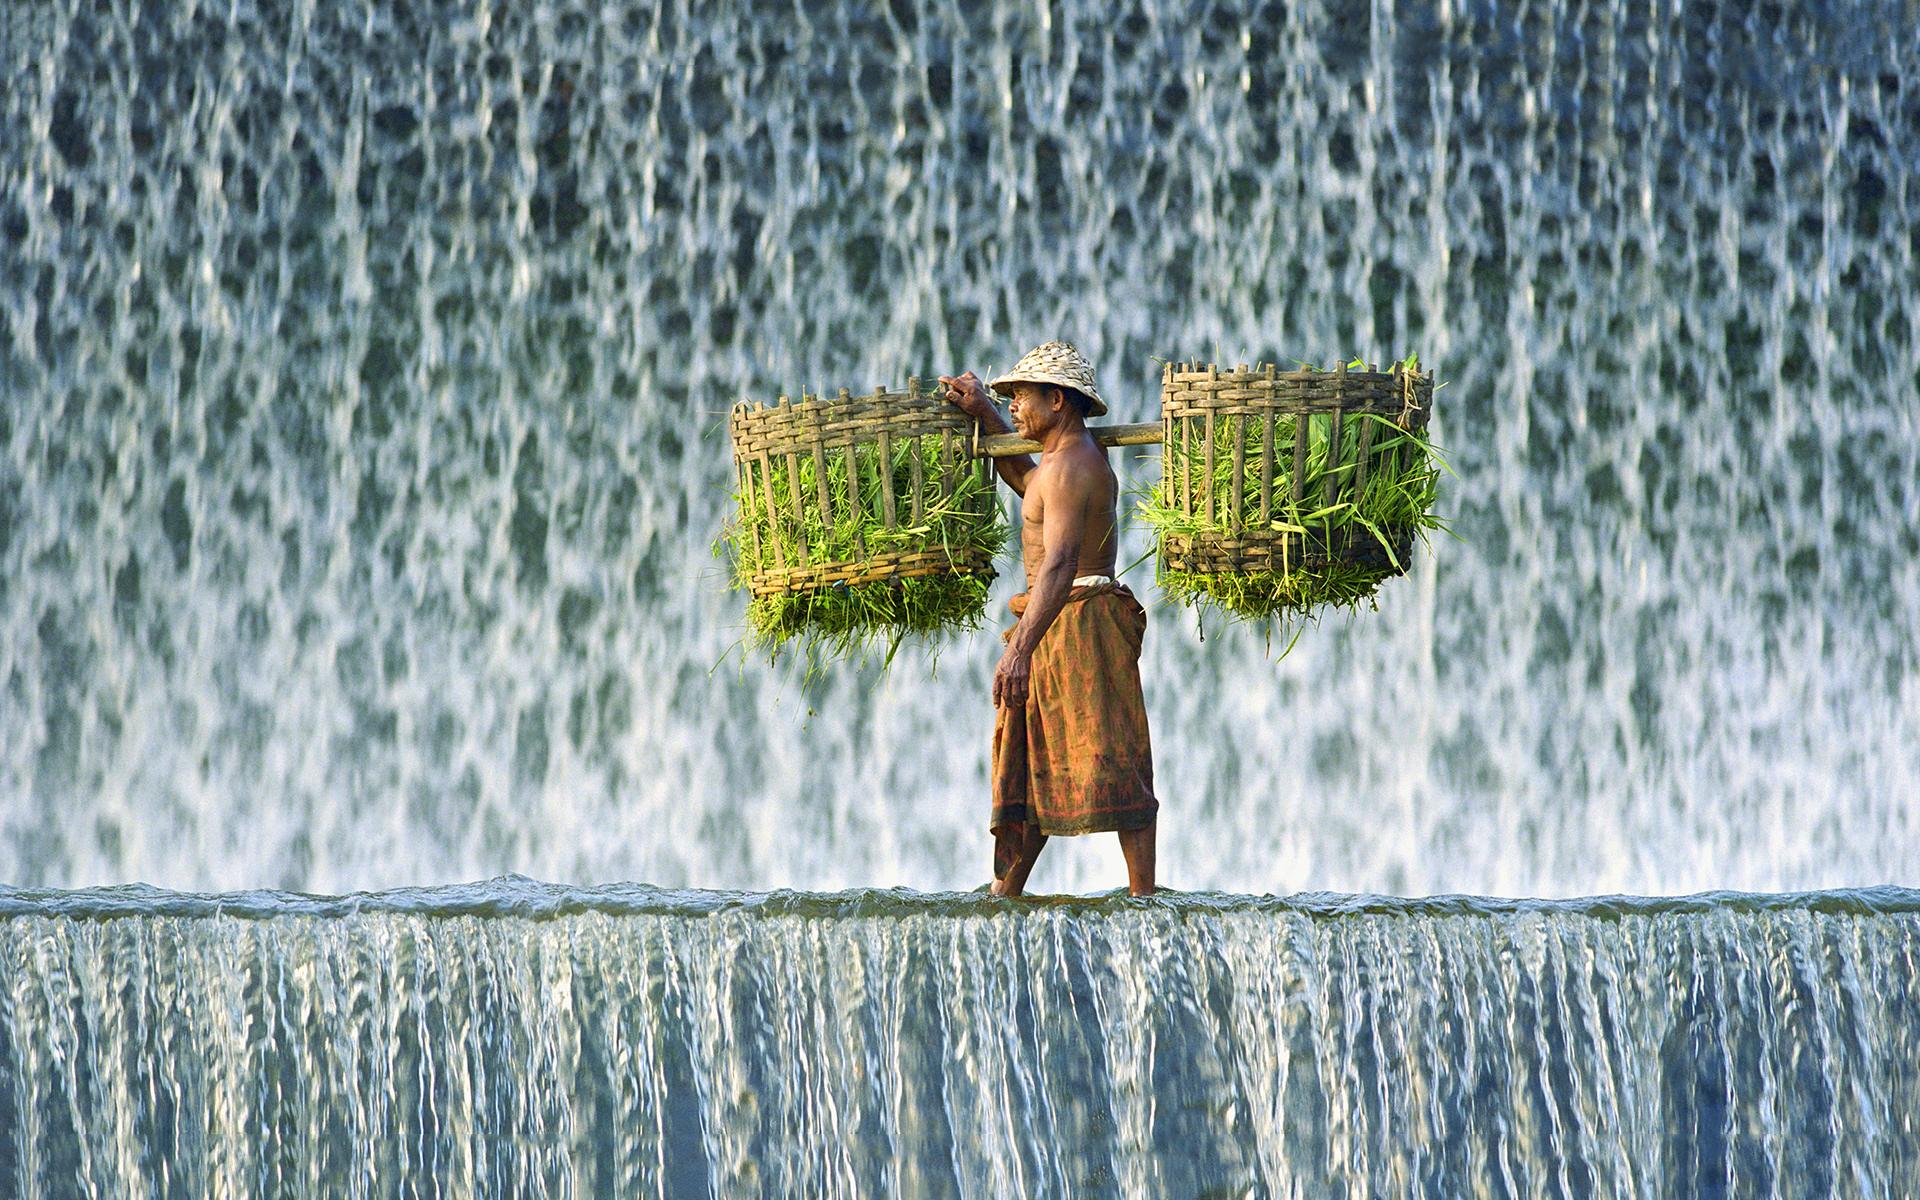 waterfall wallpaper creative